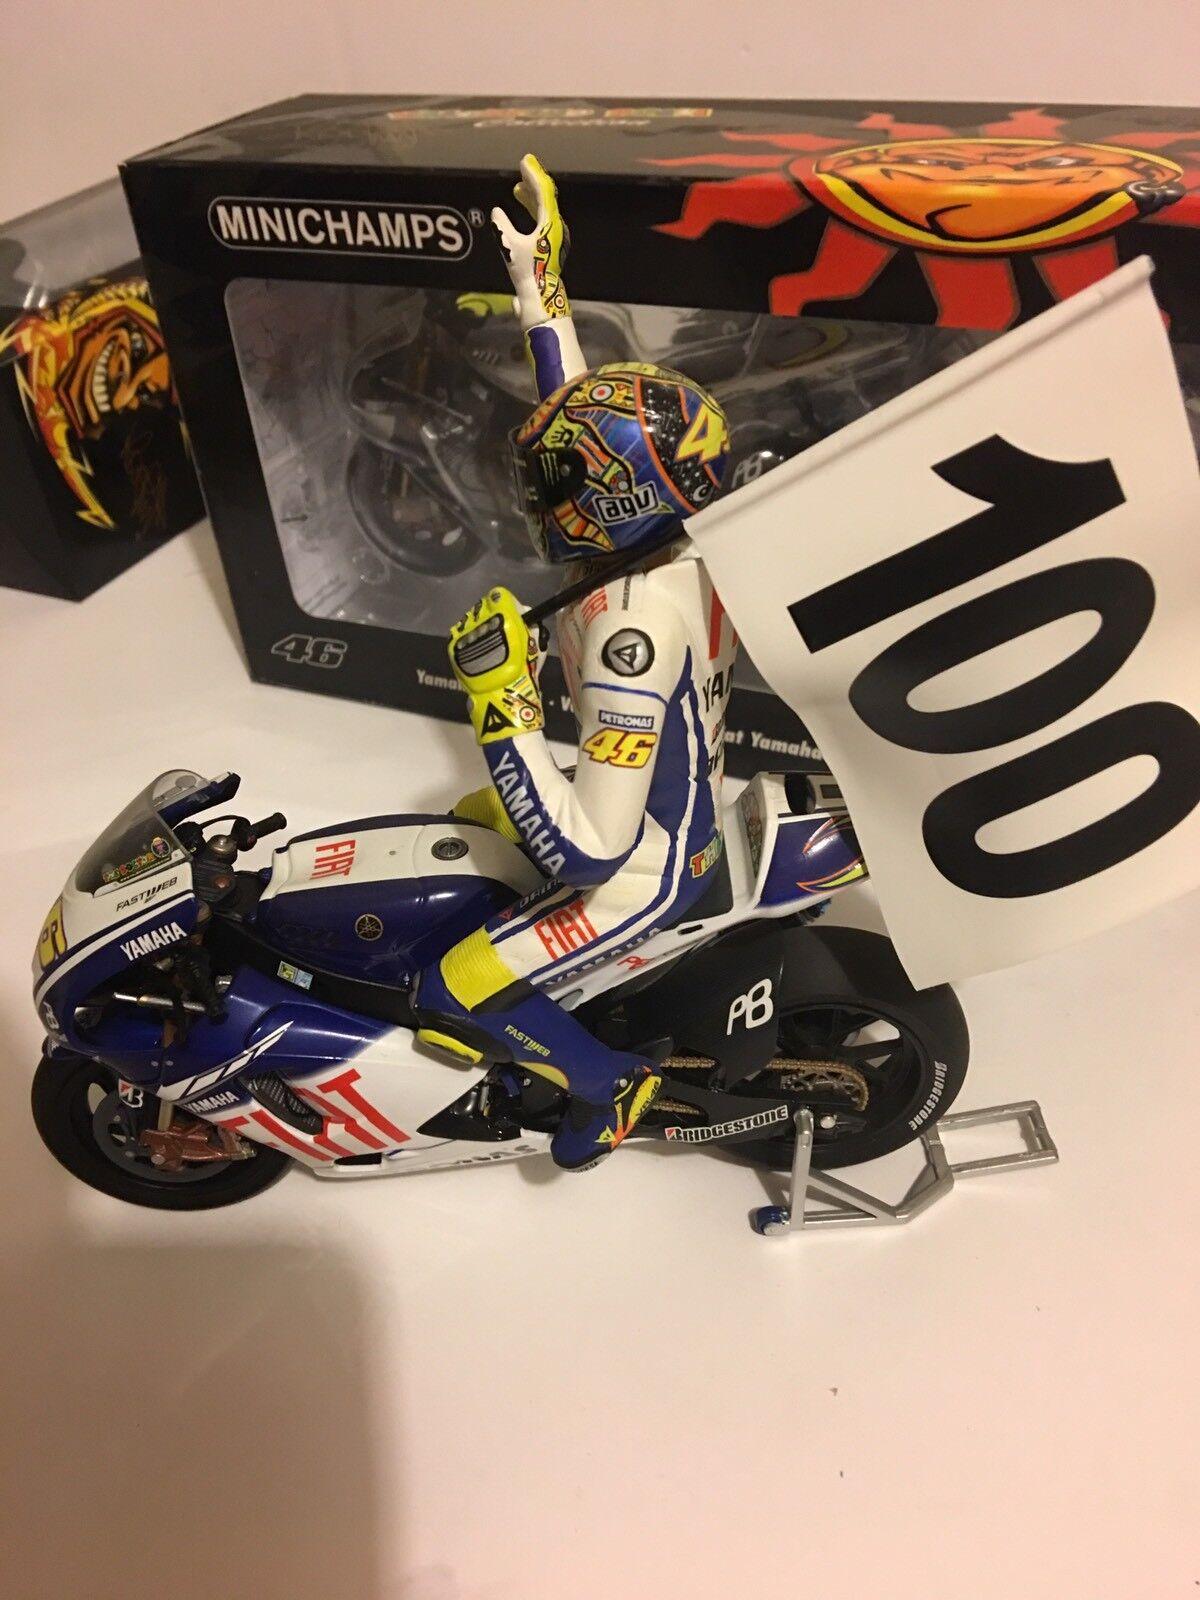 1 12 Minichamps Yamaha YZR M1  + Figure Valentino Rossi Assen 2009 100 Gp wins